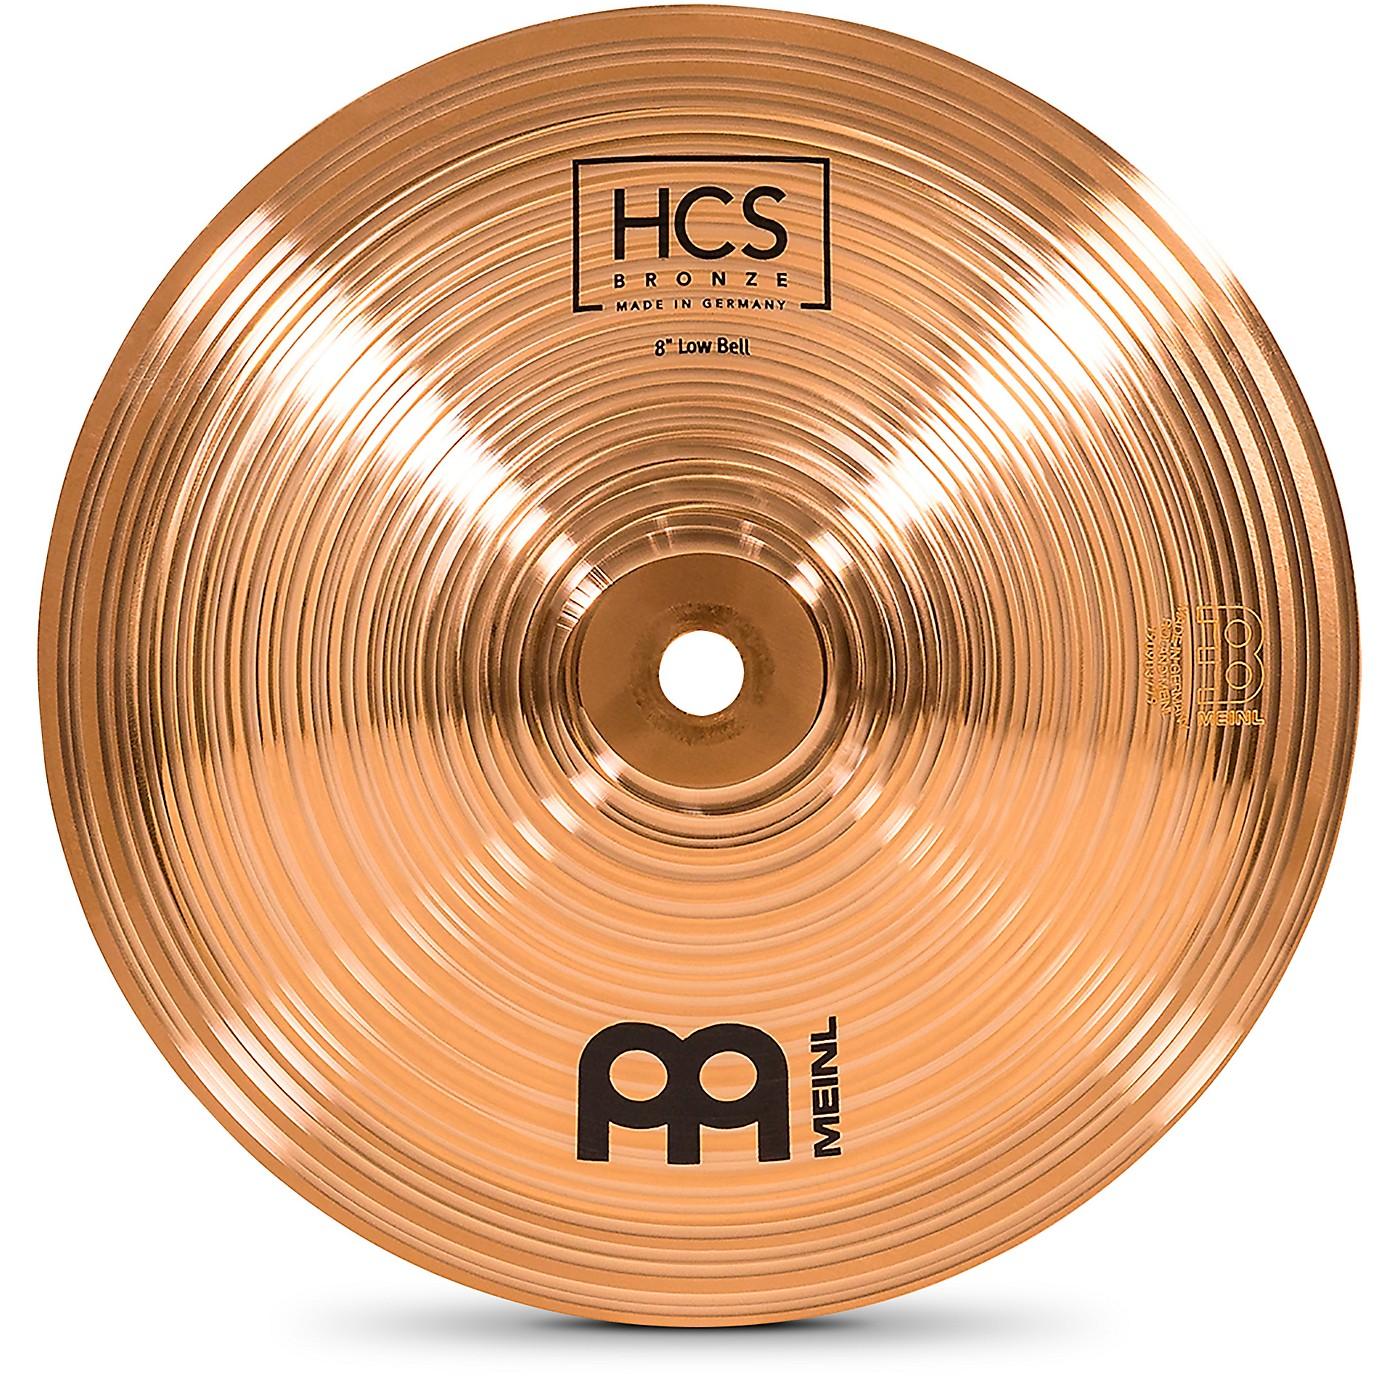 Meinl HCS Bronze Bell, Low, 8 in. thumbnail